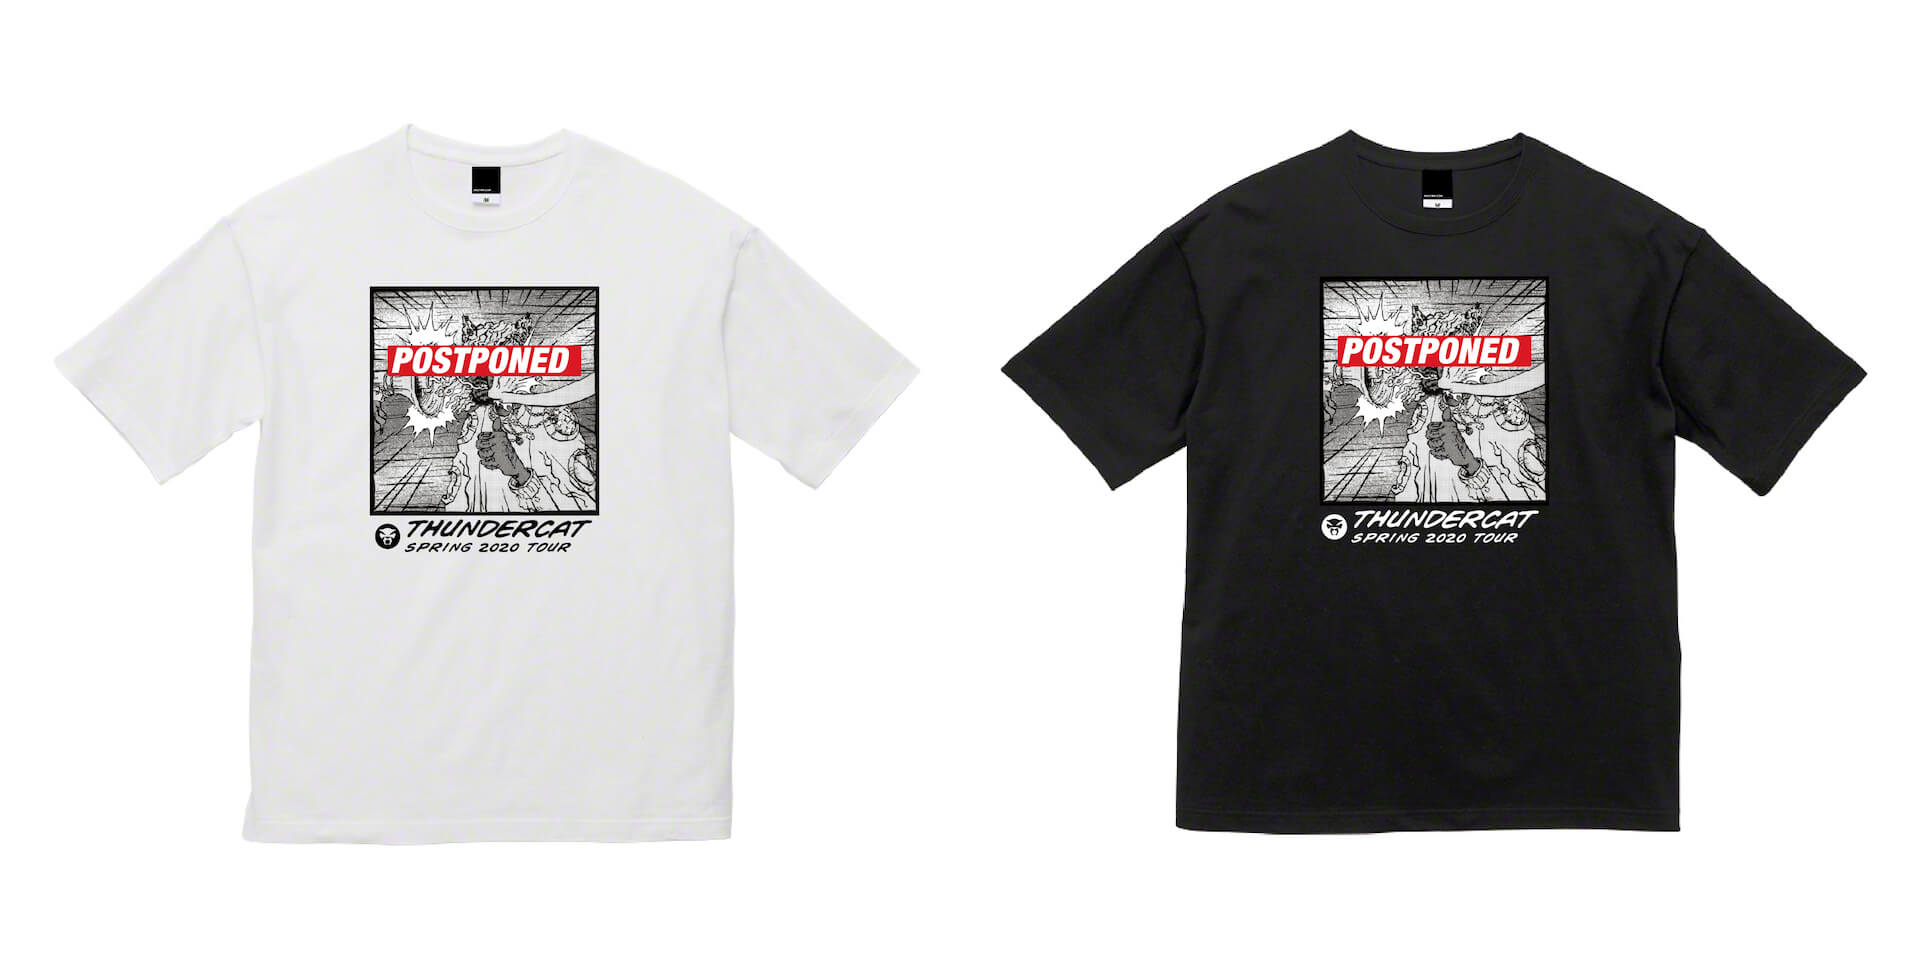 Thundercatがツアー延期Tシャツを発売!最新作『It Is What It Is』は自身初のオリコンチャートトップ10入り music200407_thundercat_tshirt_3